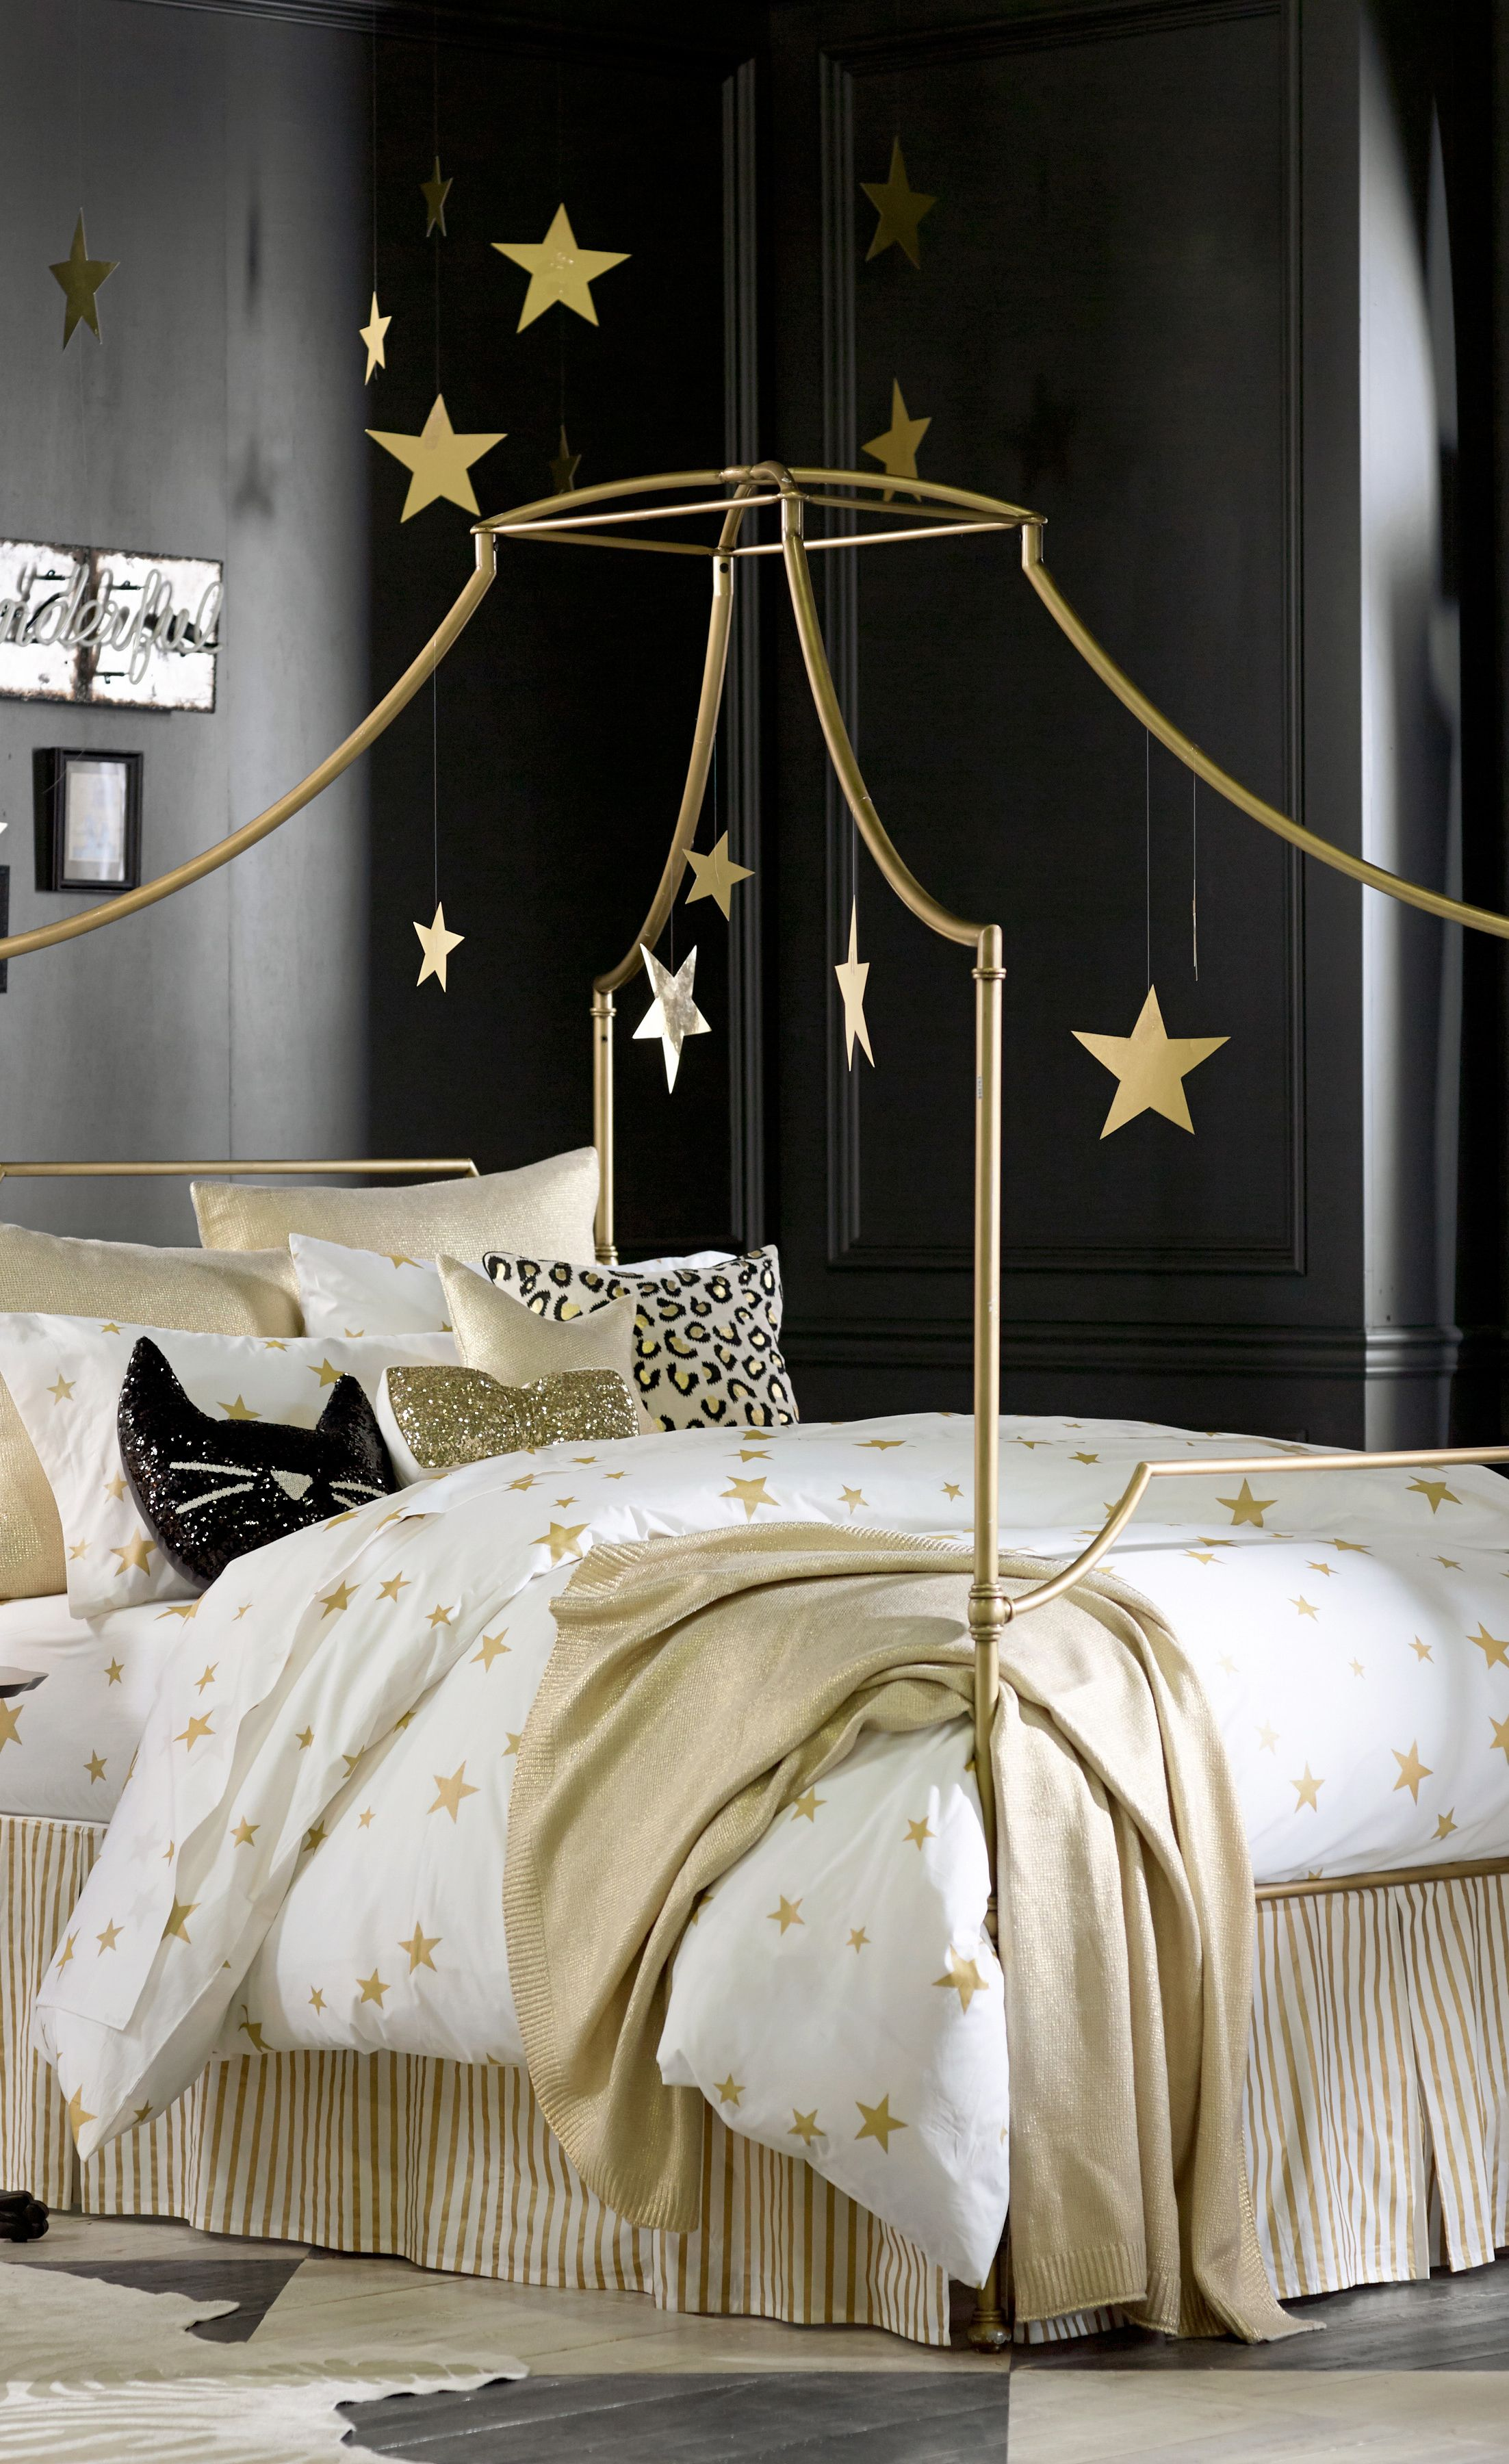 Maison Canopy Bed reg. price $699 u2013 $999 SPECIAL $599 u2013 $899 Visit bit. & Maison Canopy Bed reg. price $699 u2013 $999 SPECIAL $599 u2013 $899 Visit ...